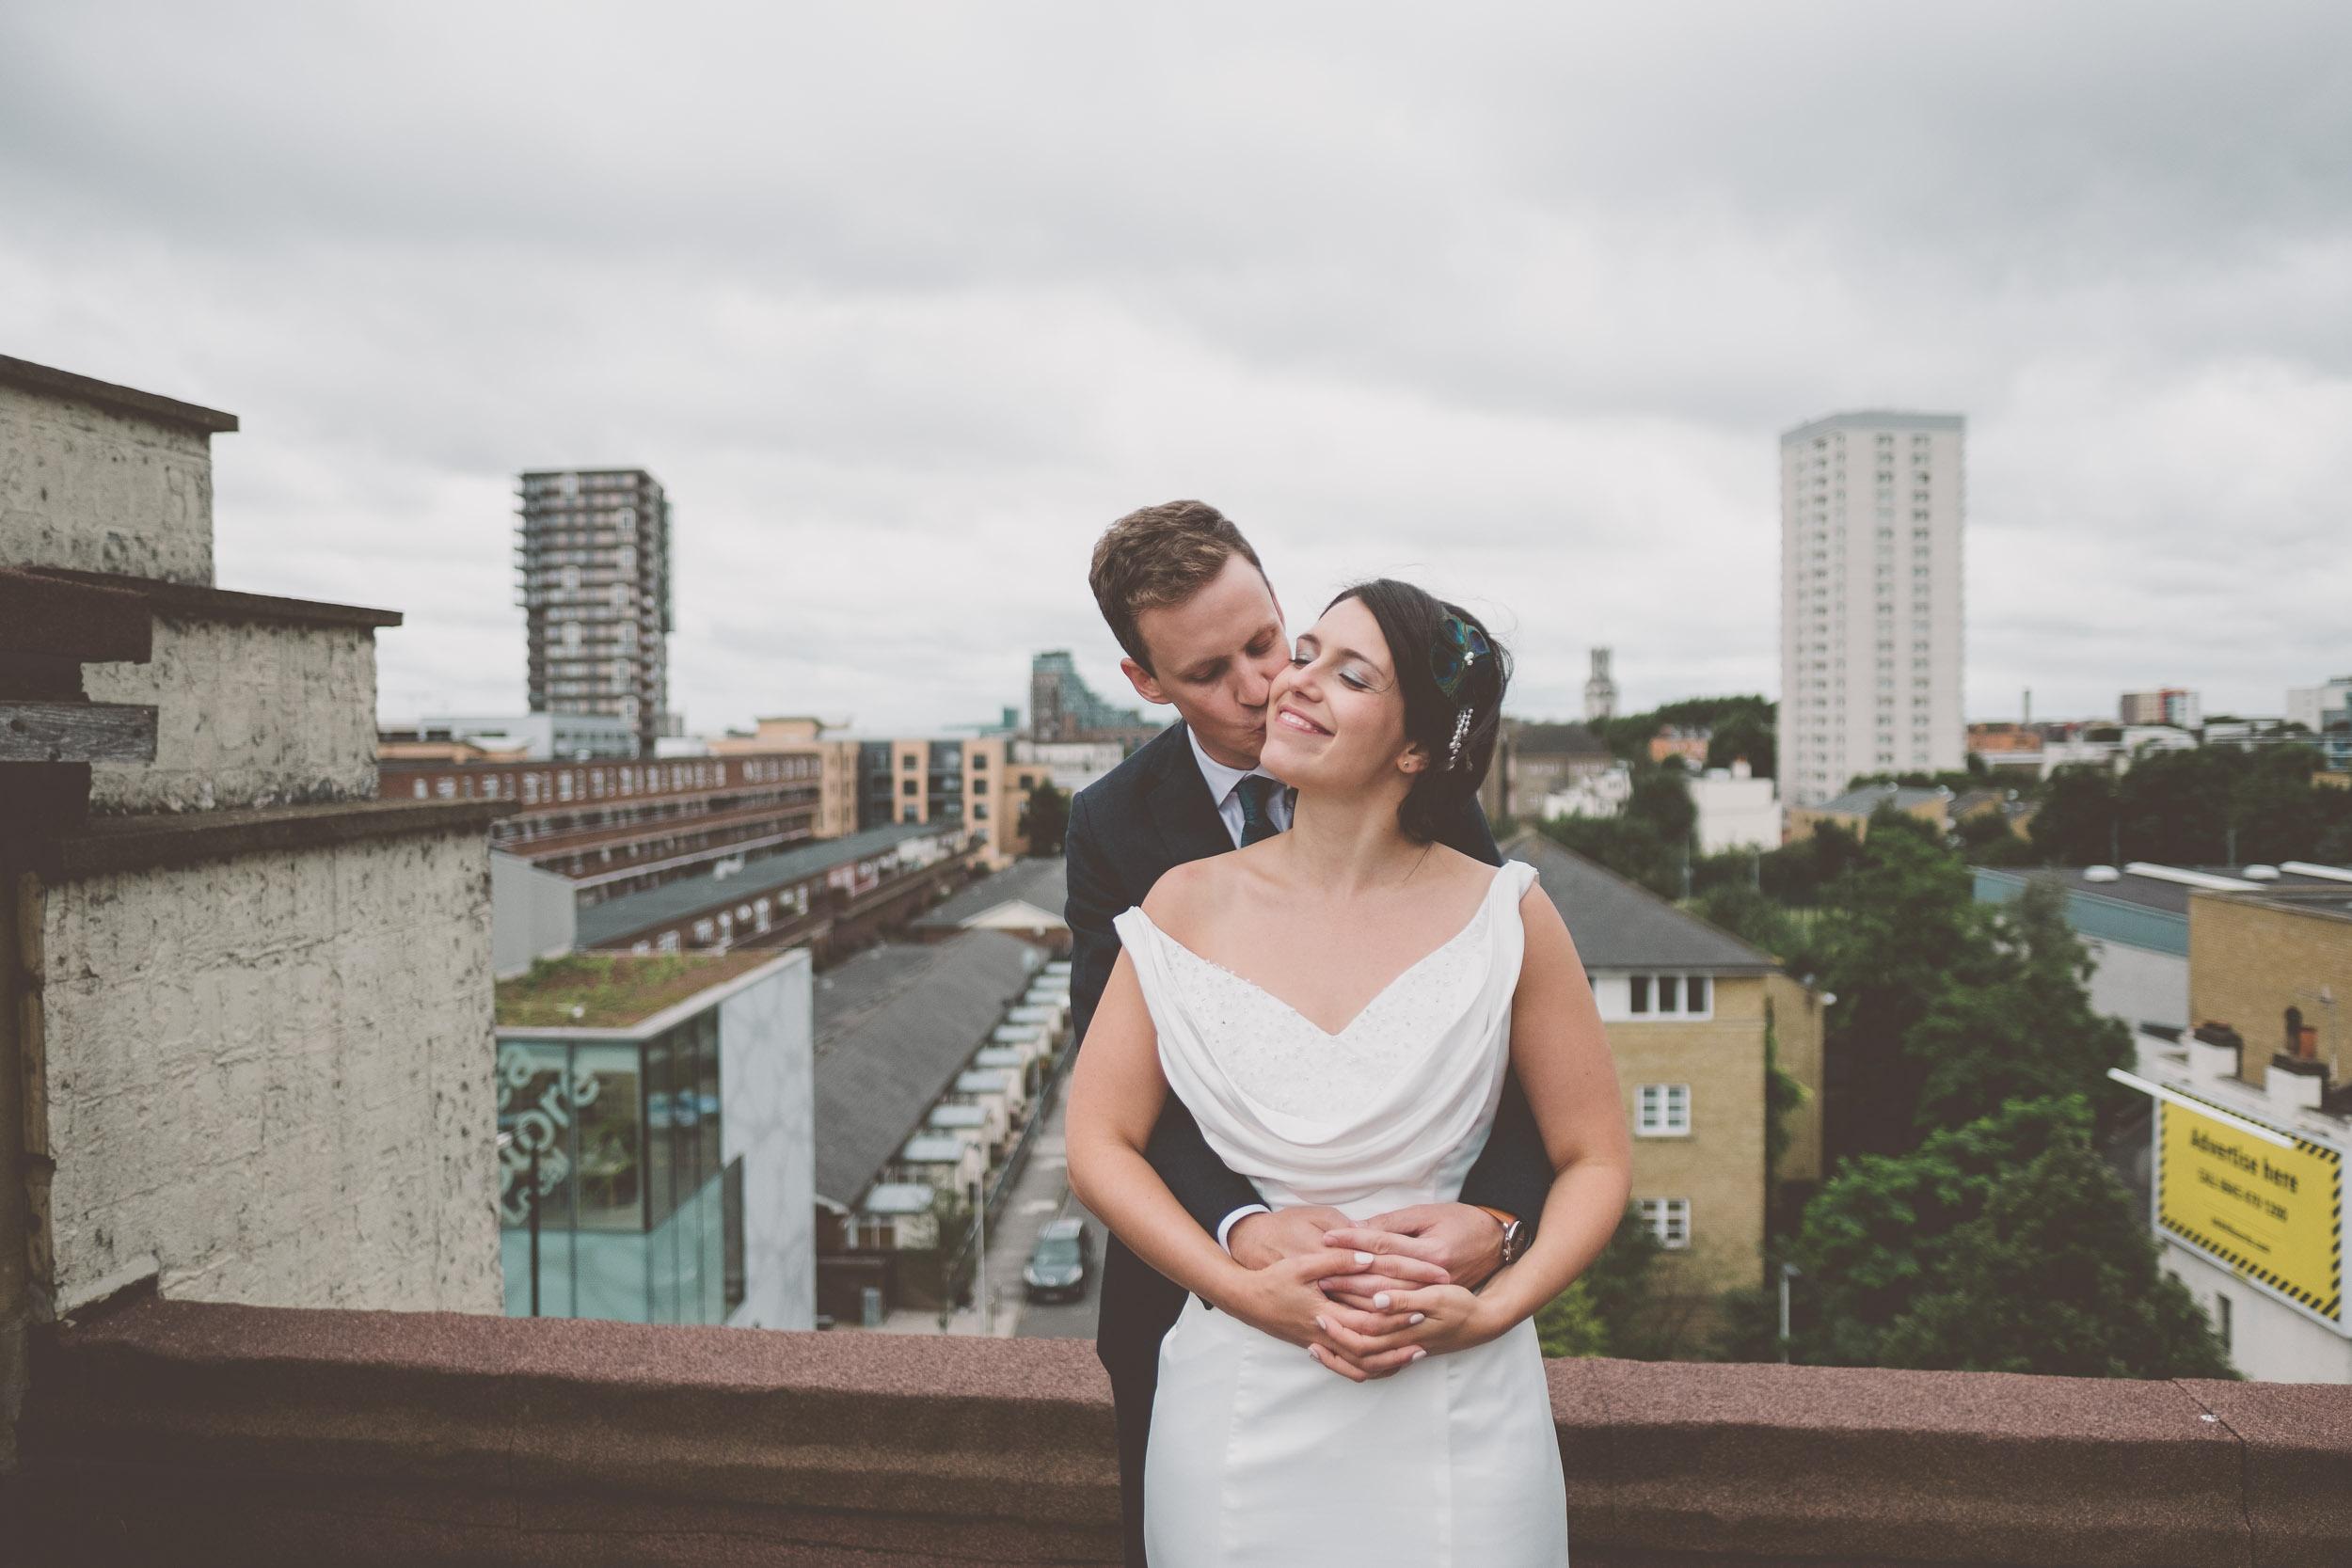 islington-town-hall-4th-floor-studios-wedding295.jpg